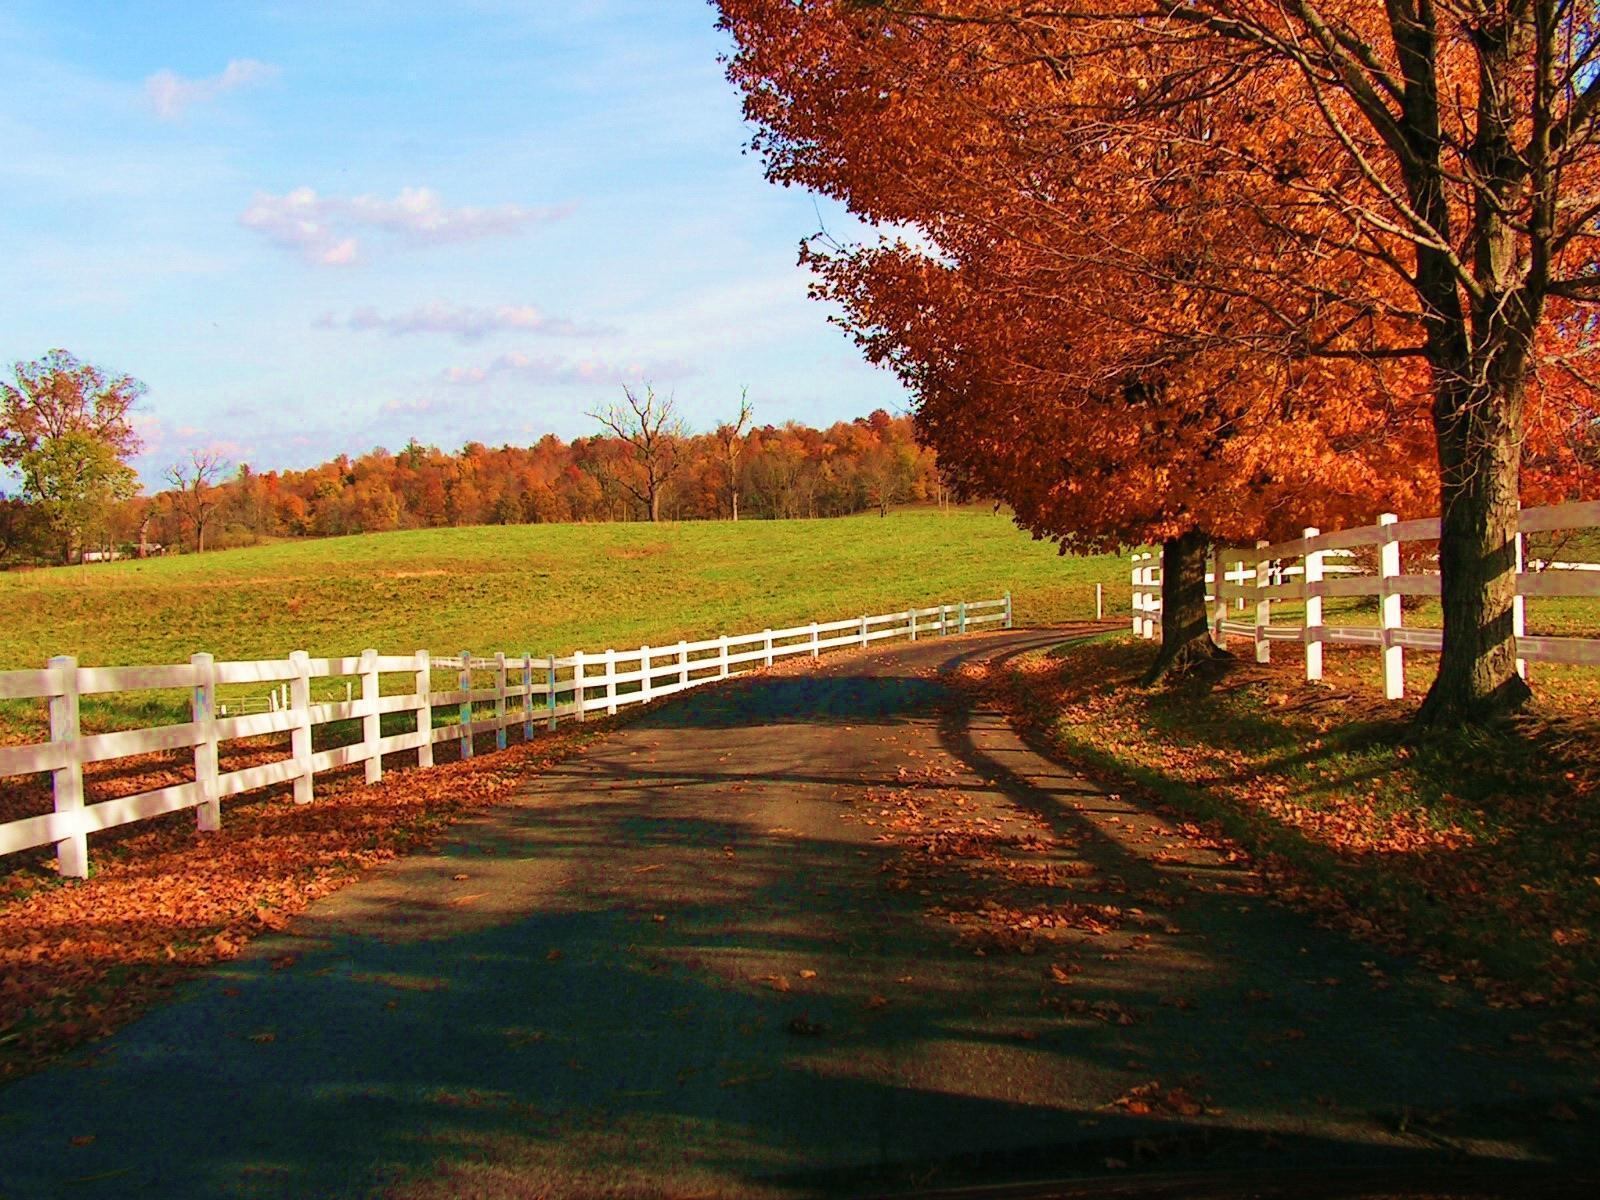 Autumn Season Wallpapers Top Free Autumn Season